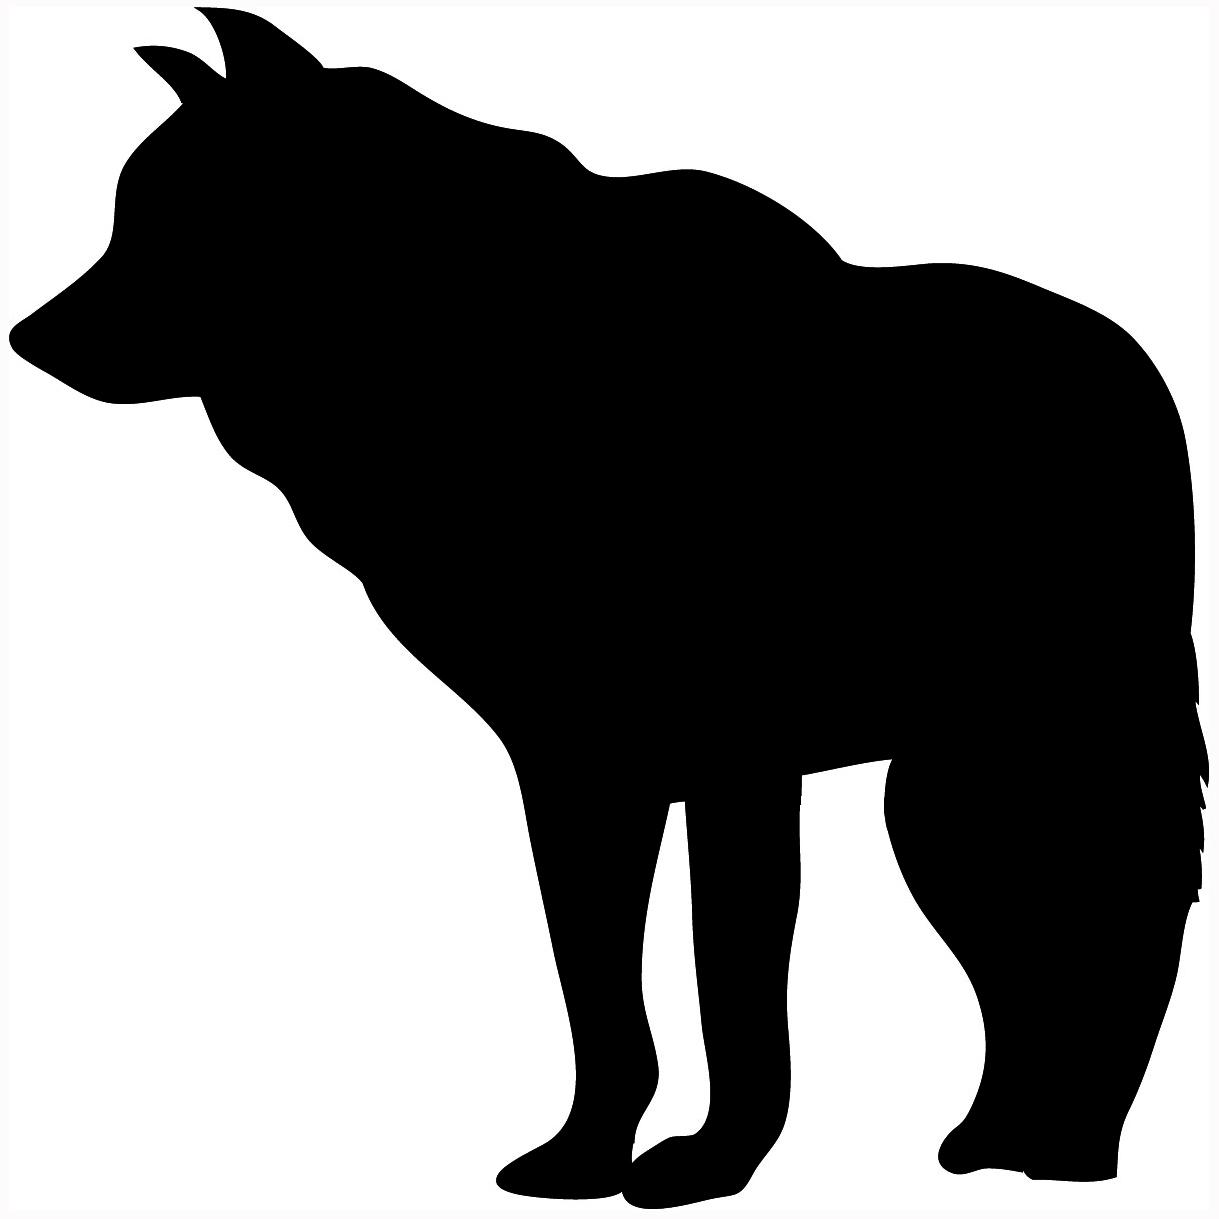 1219x1219 Wolf Silhouette Clip Art Clipart